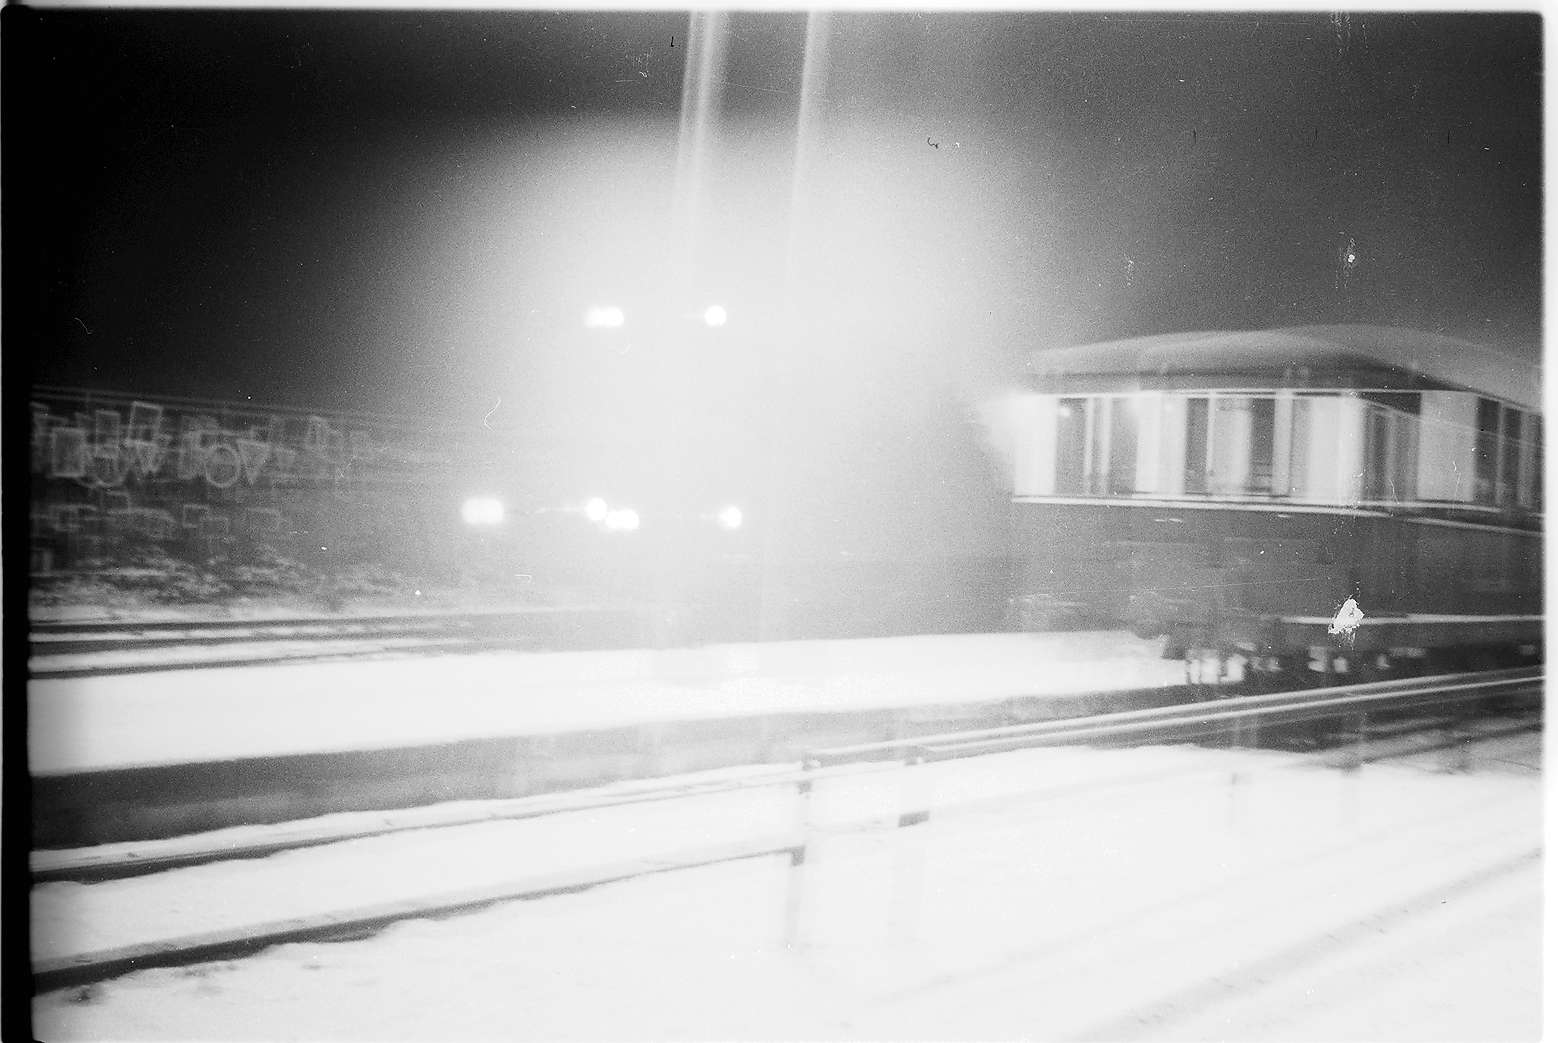 Gmp 298, Lok 21, Nachtaufnahme Bahnhof Gammertingen, Bild 1